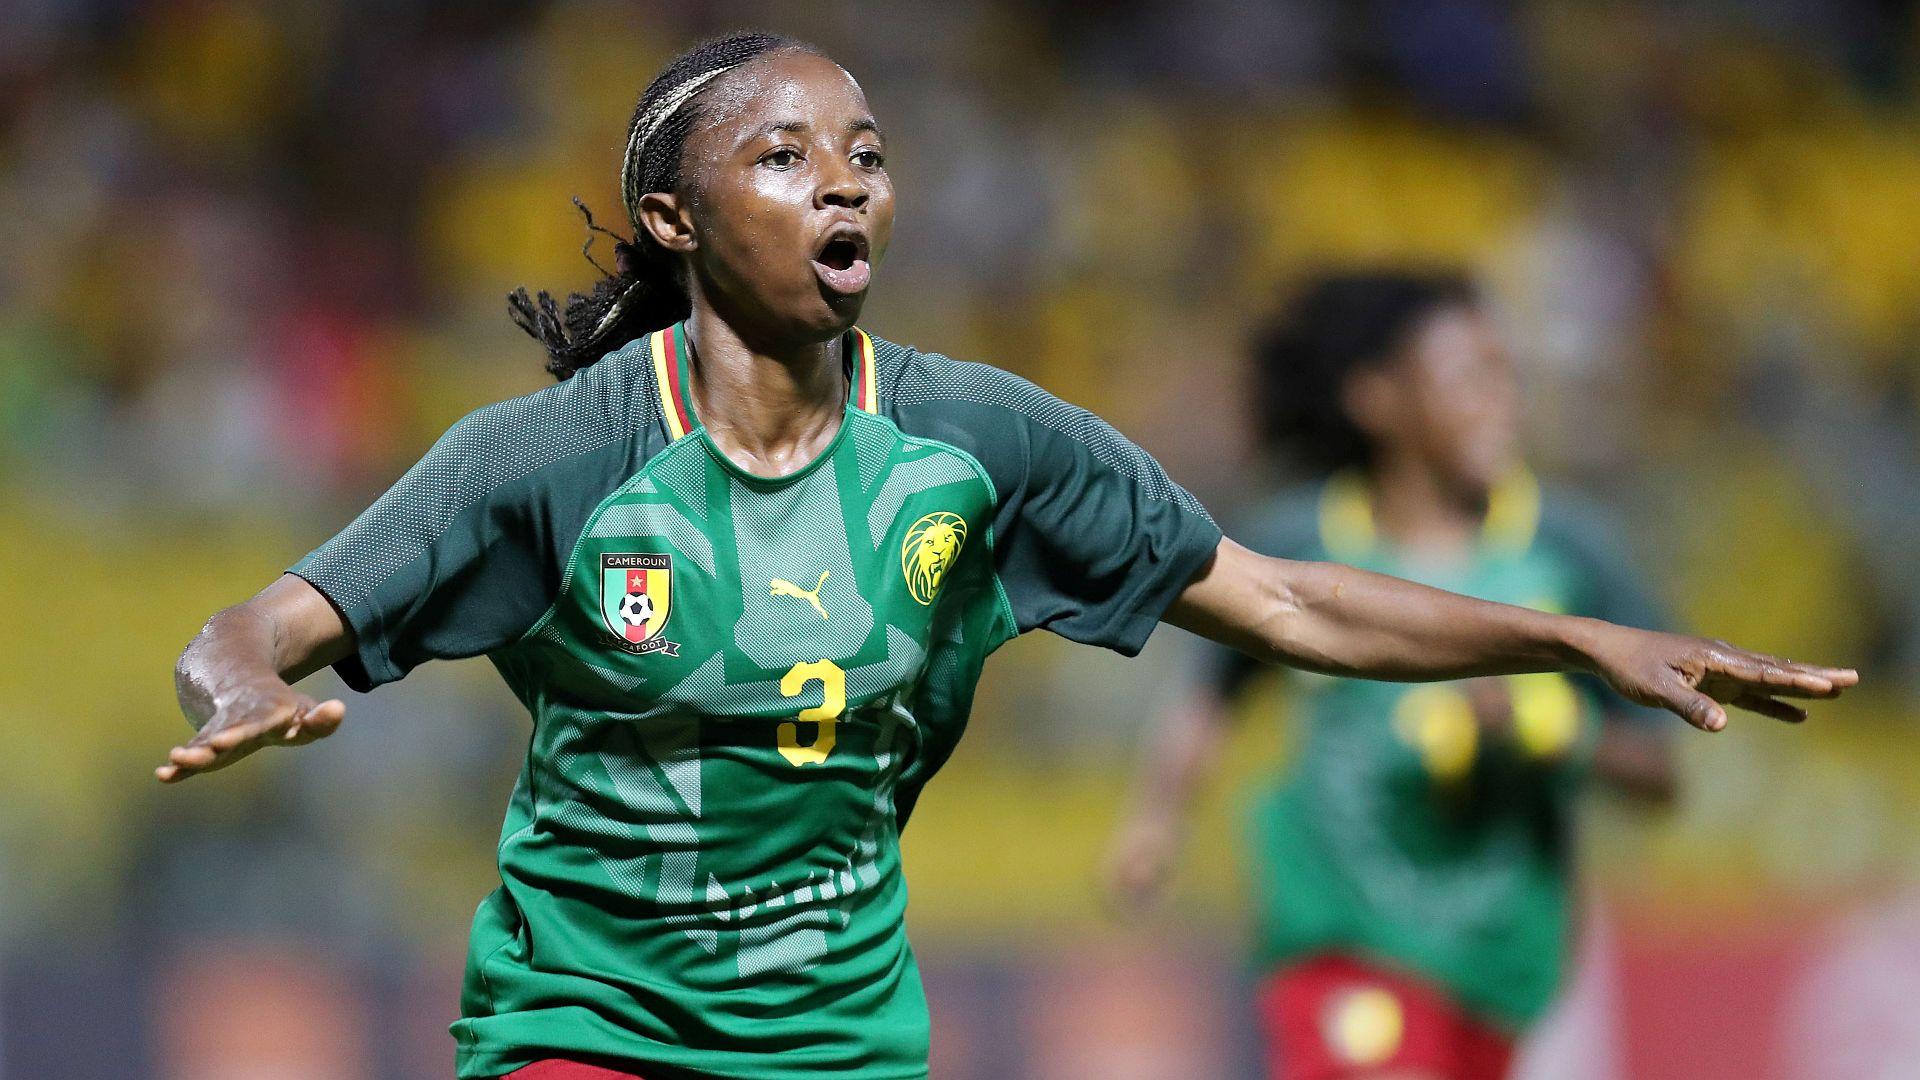 Ajara Nchout scores winner as Valerenga edge Sandviken